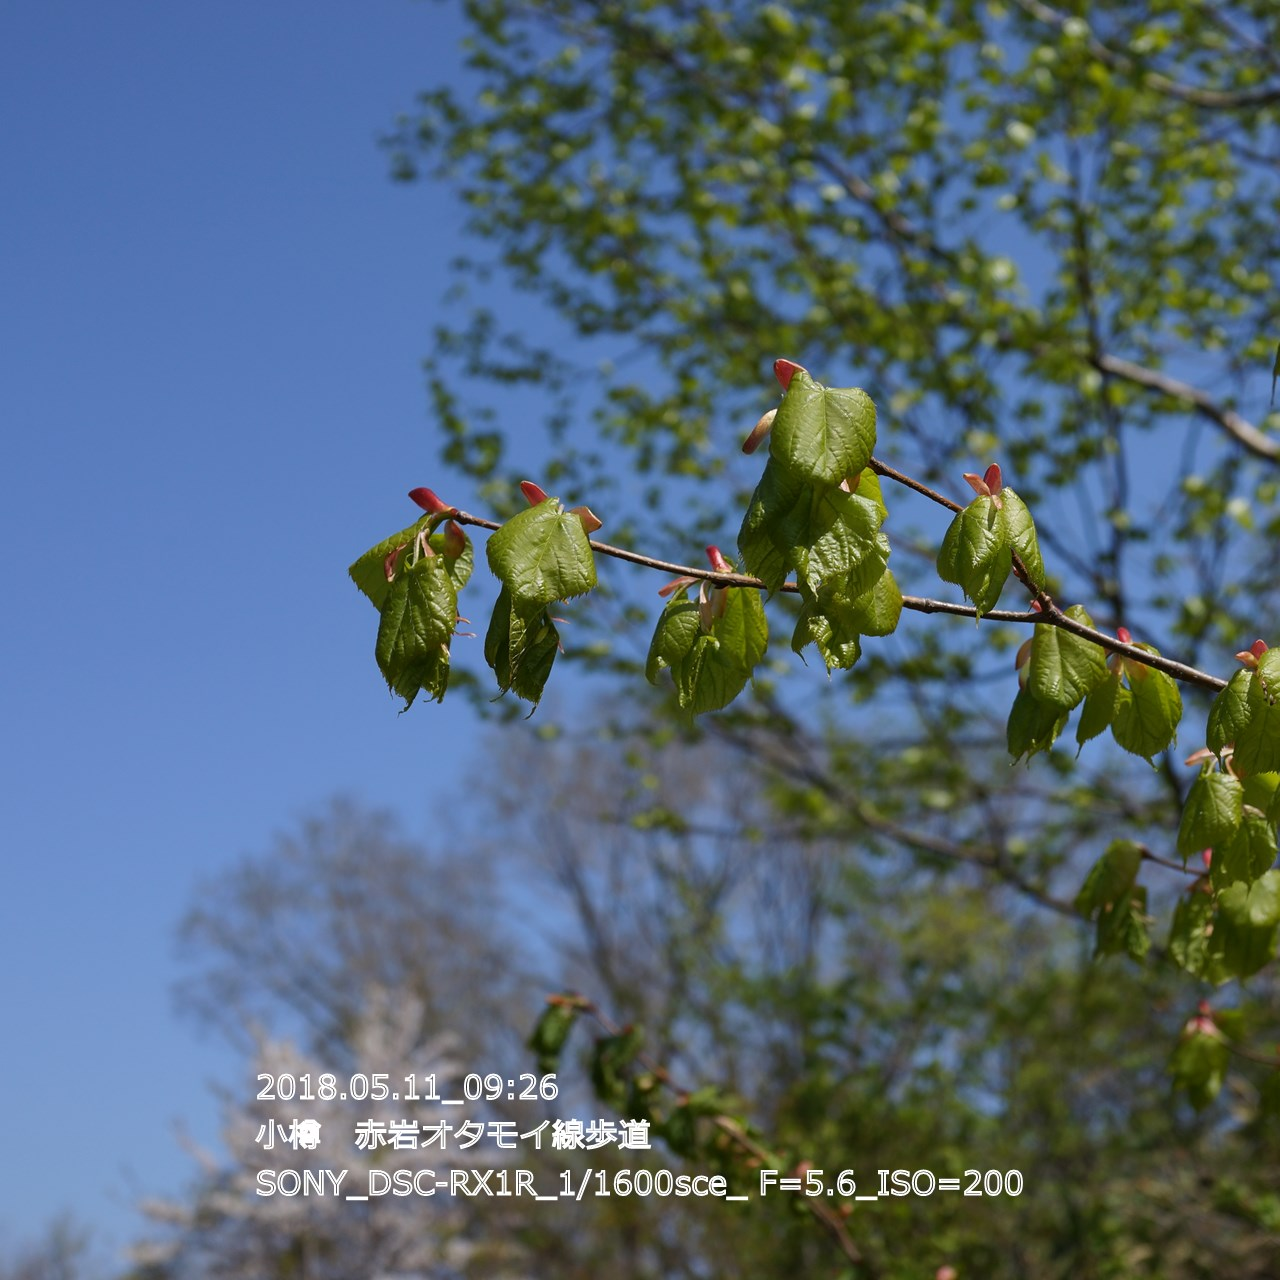 2018/05/11_19:45:18  DSC05296.jpg